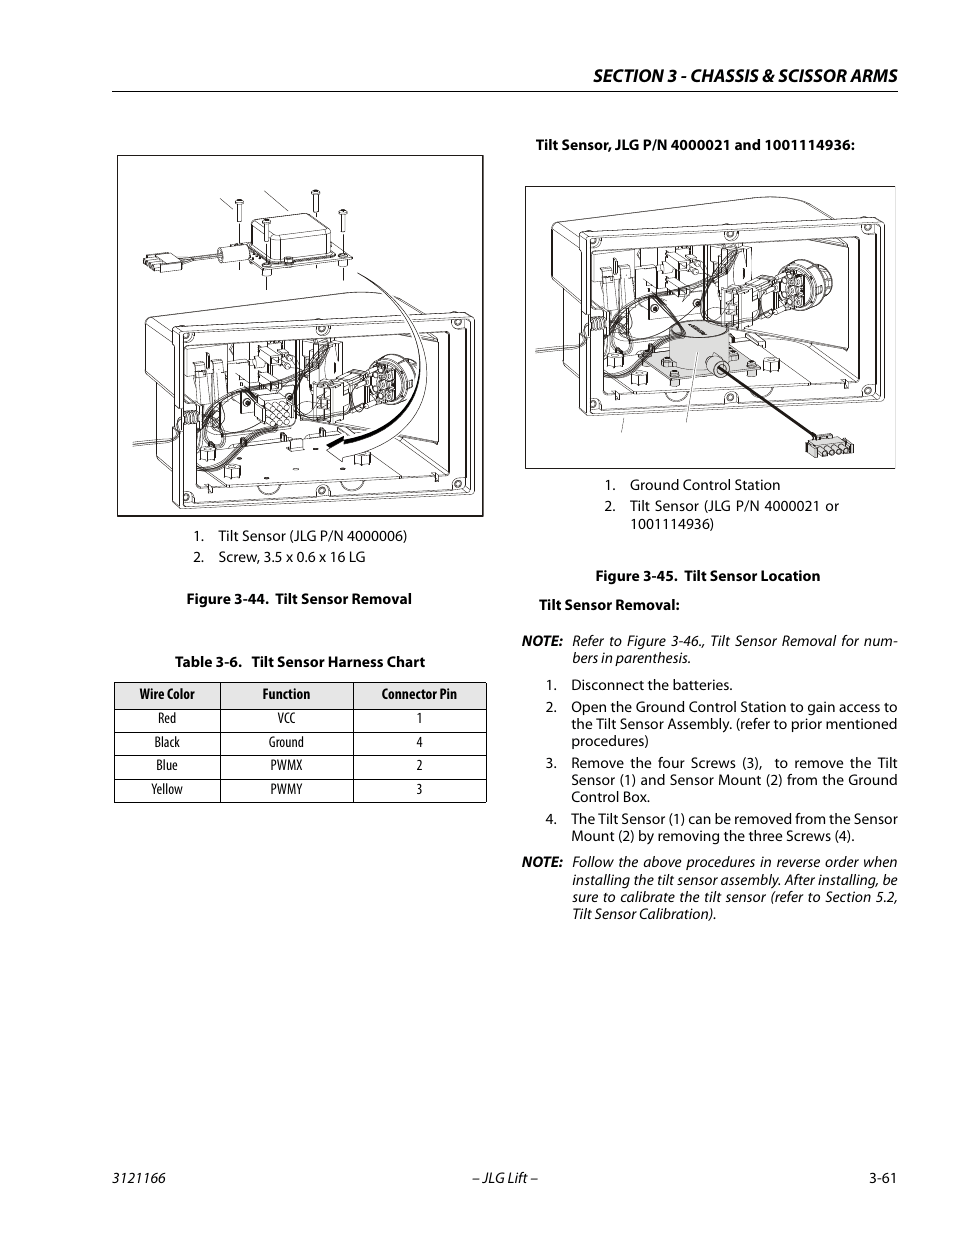 jlg 3246es wiring diagram schematic diagramjlg 40e battery wiring diagram wiring diagram jlg e300ajp jlg 40e battery wiring diagram auto electrical